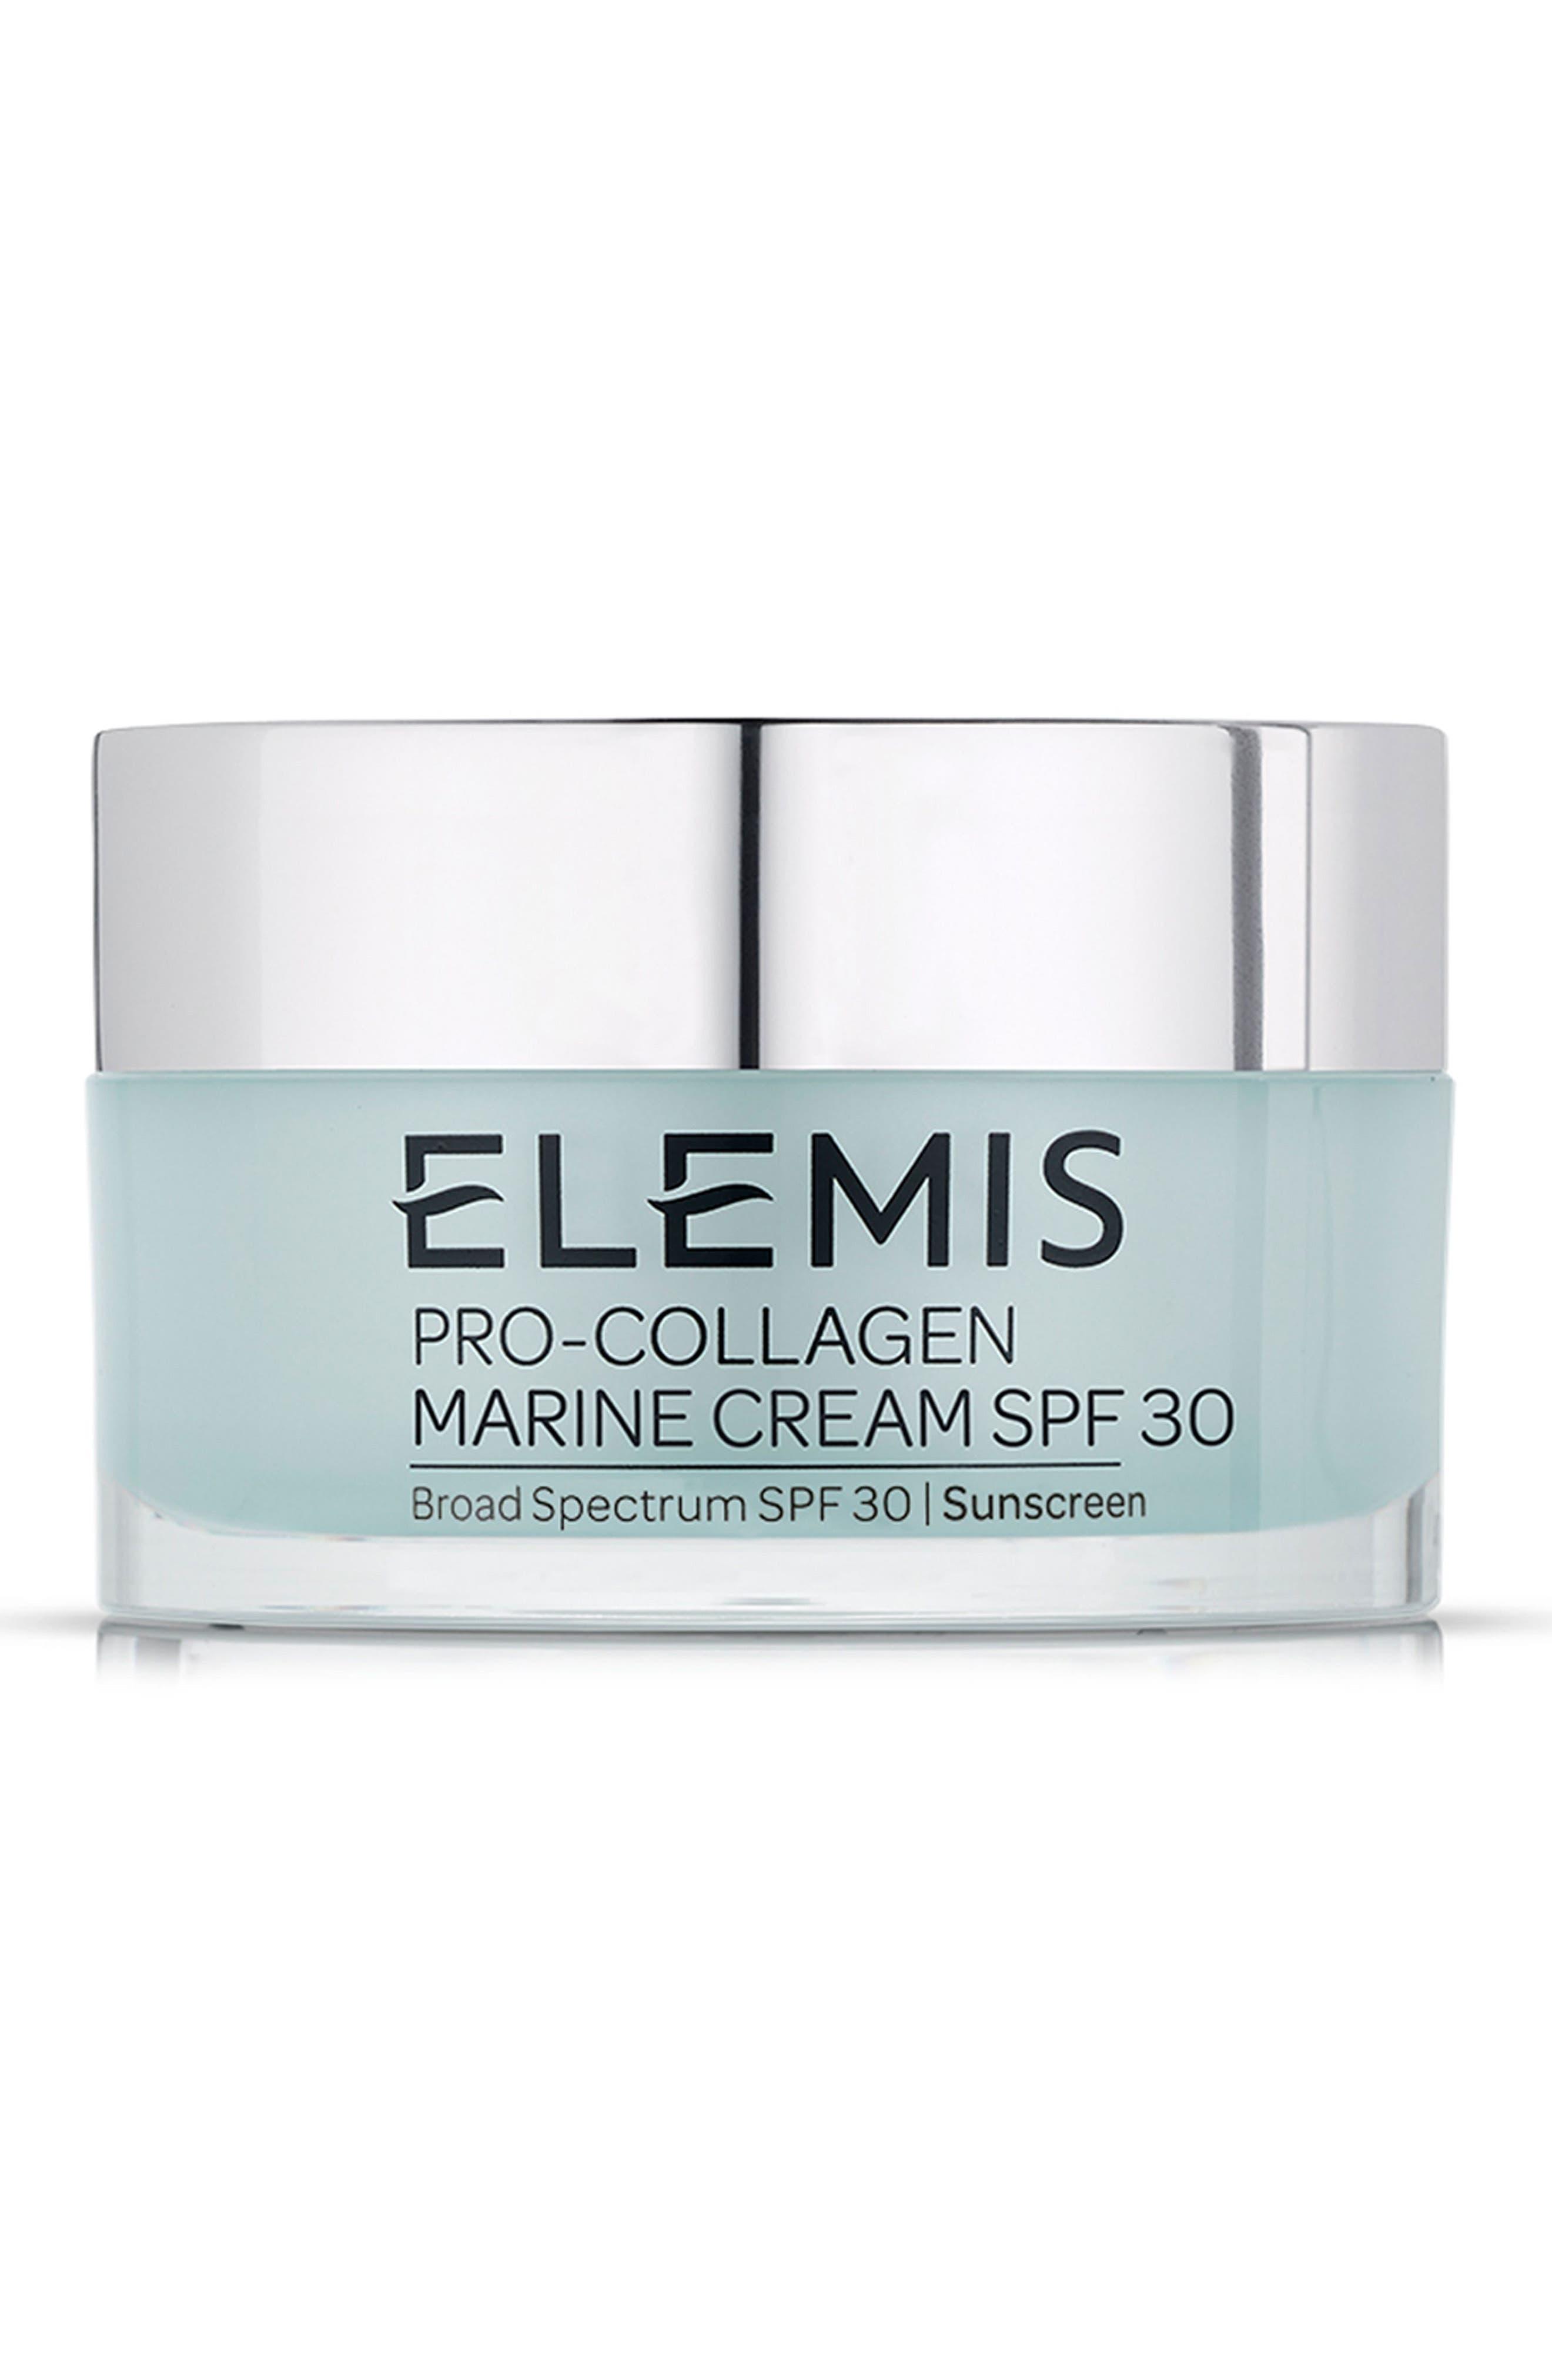 Pro-Collagen Marine Cream SPF 30,                             Main thumbnail 1, color,                             NO COLOR